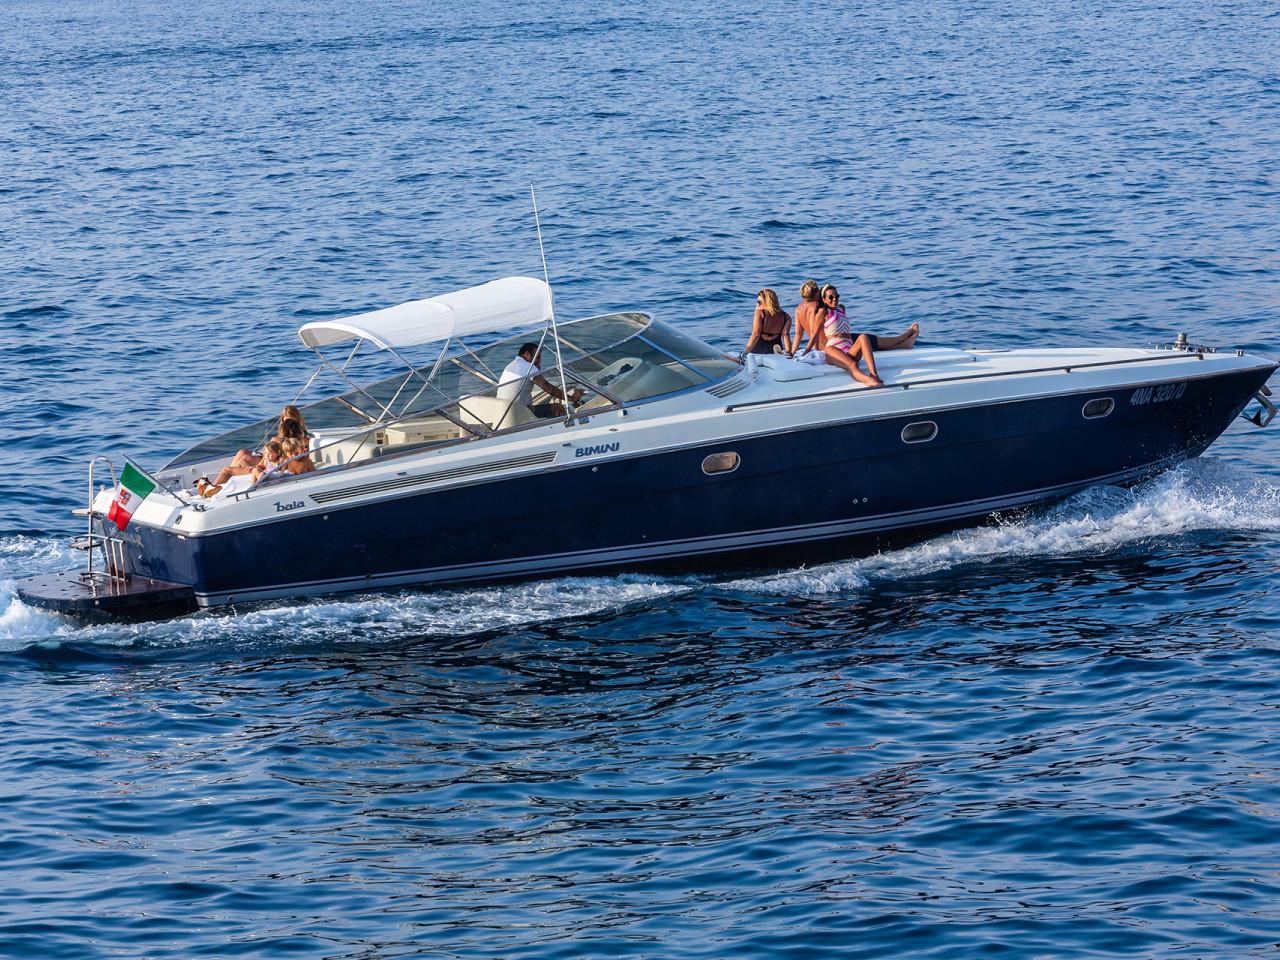 YACHT BAIA BIMINI | Mar Amar Sorrento boat tour